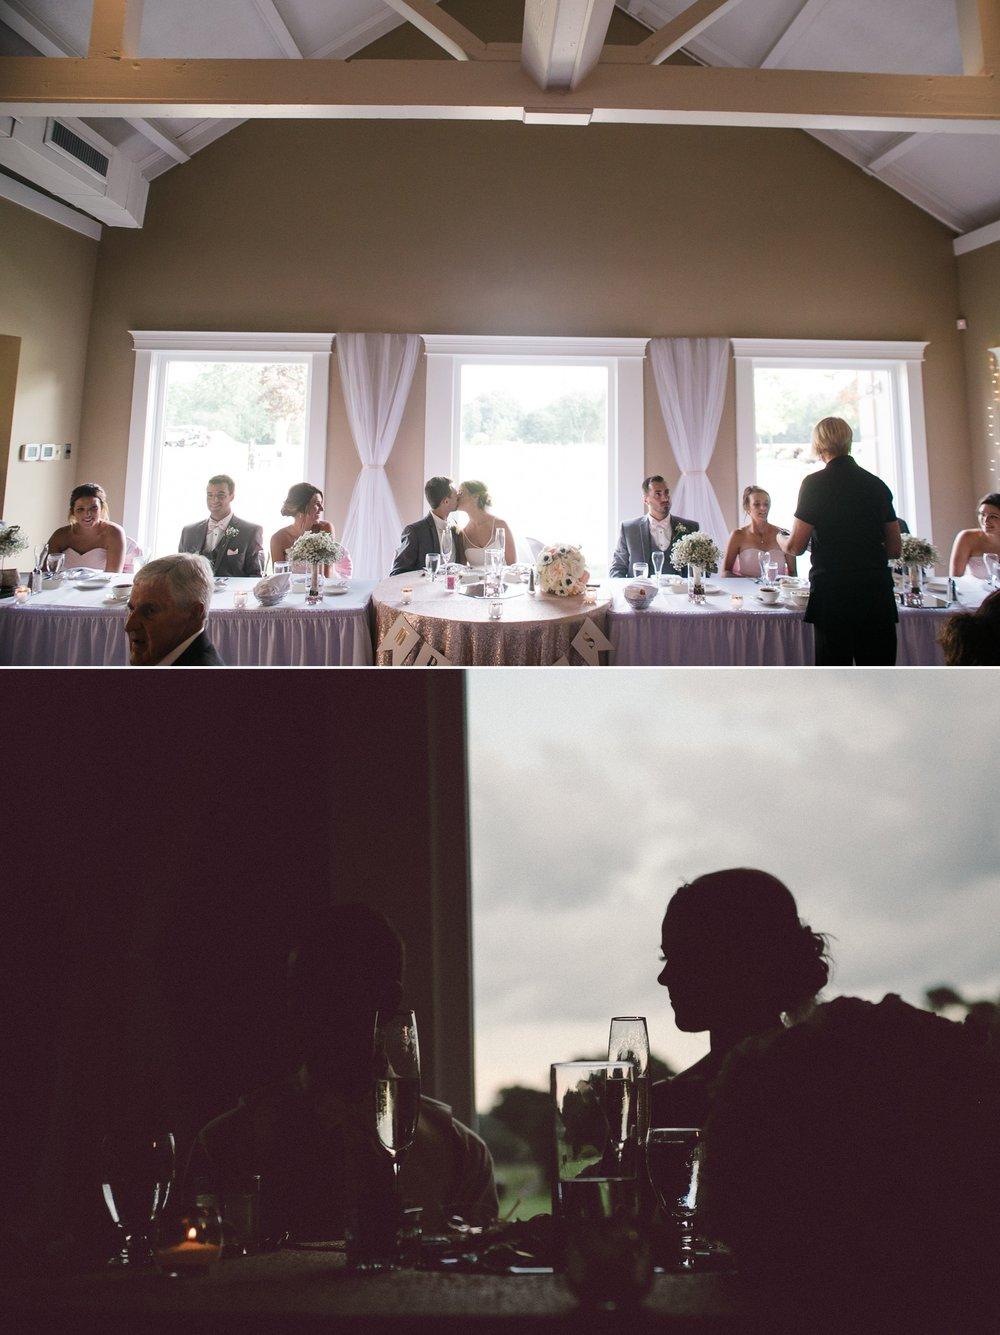 Highland-meadows-wedding-photos 22.jpg